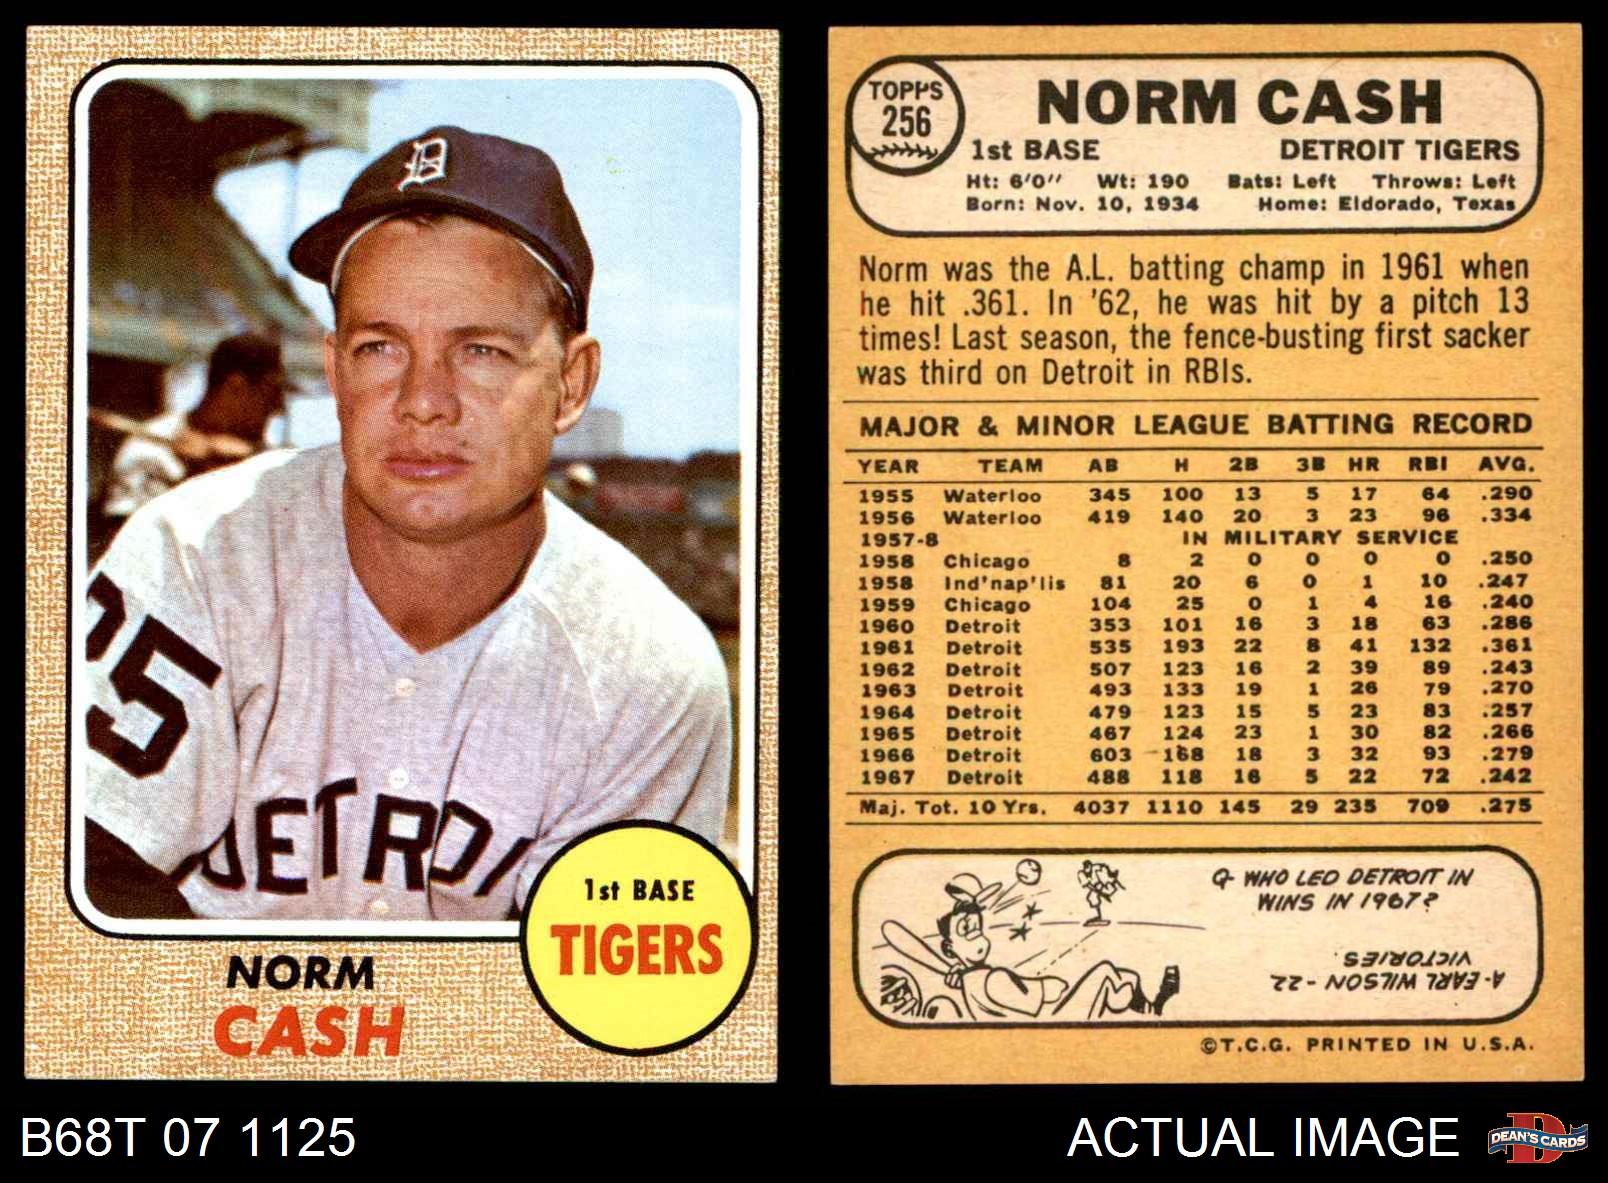 Baseball 1968 Topps 256 Norm Cash Detroit Tigers Baseball Card